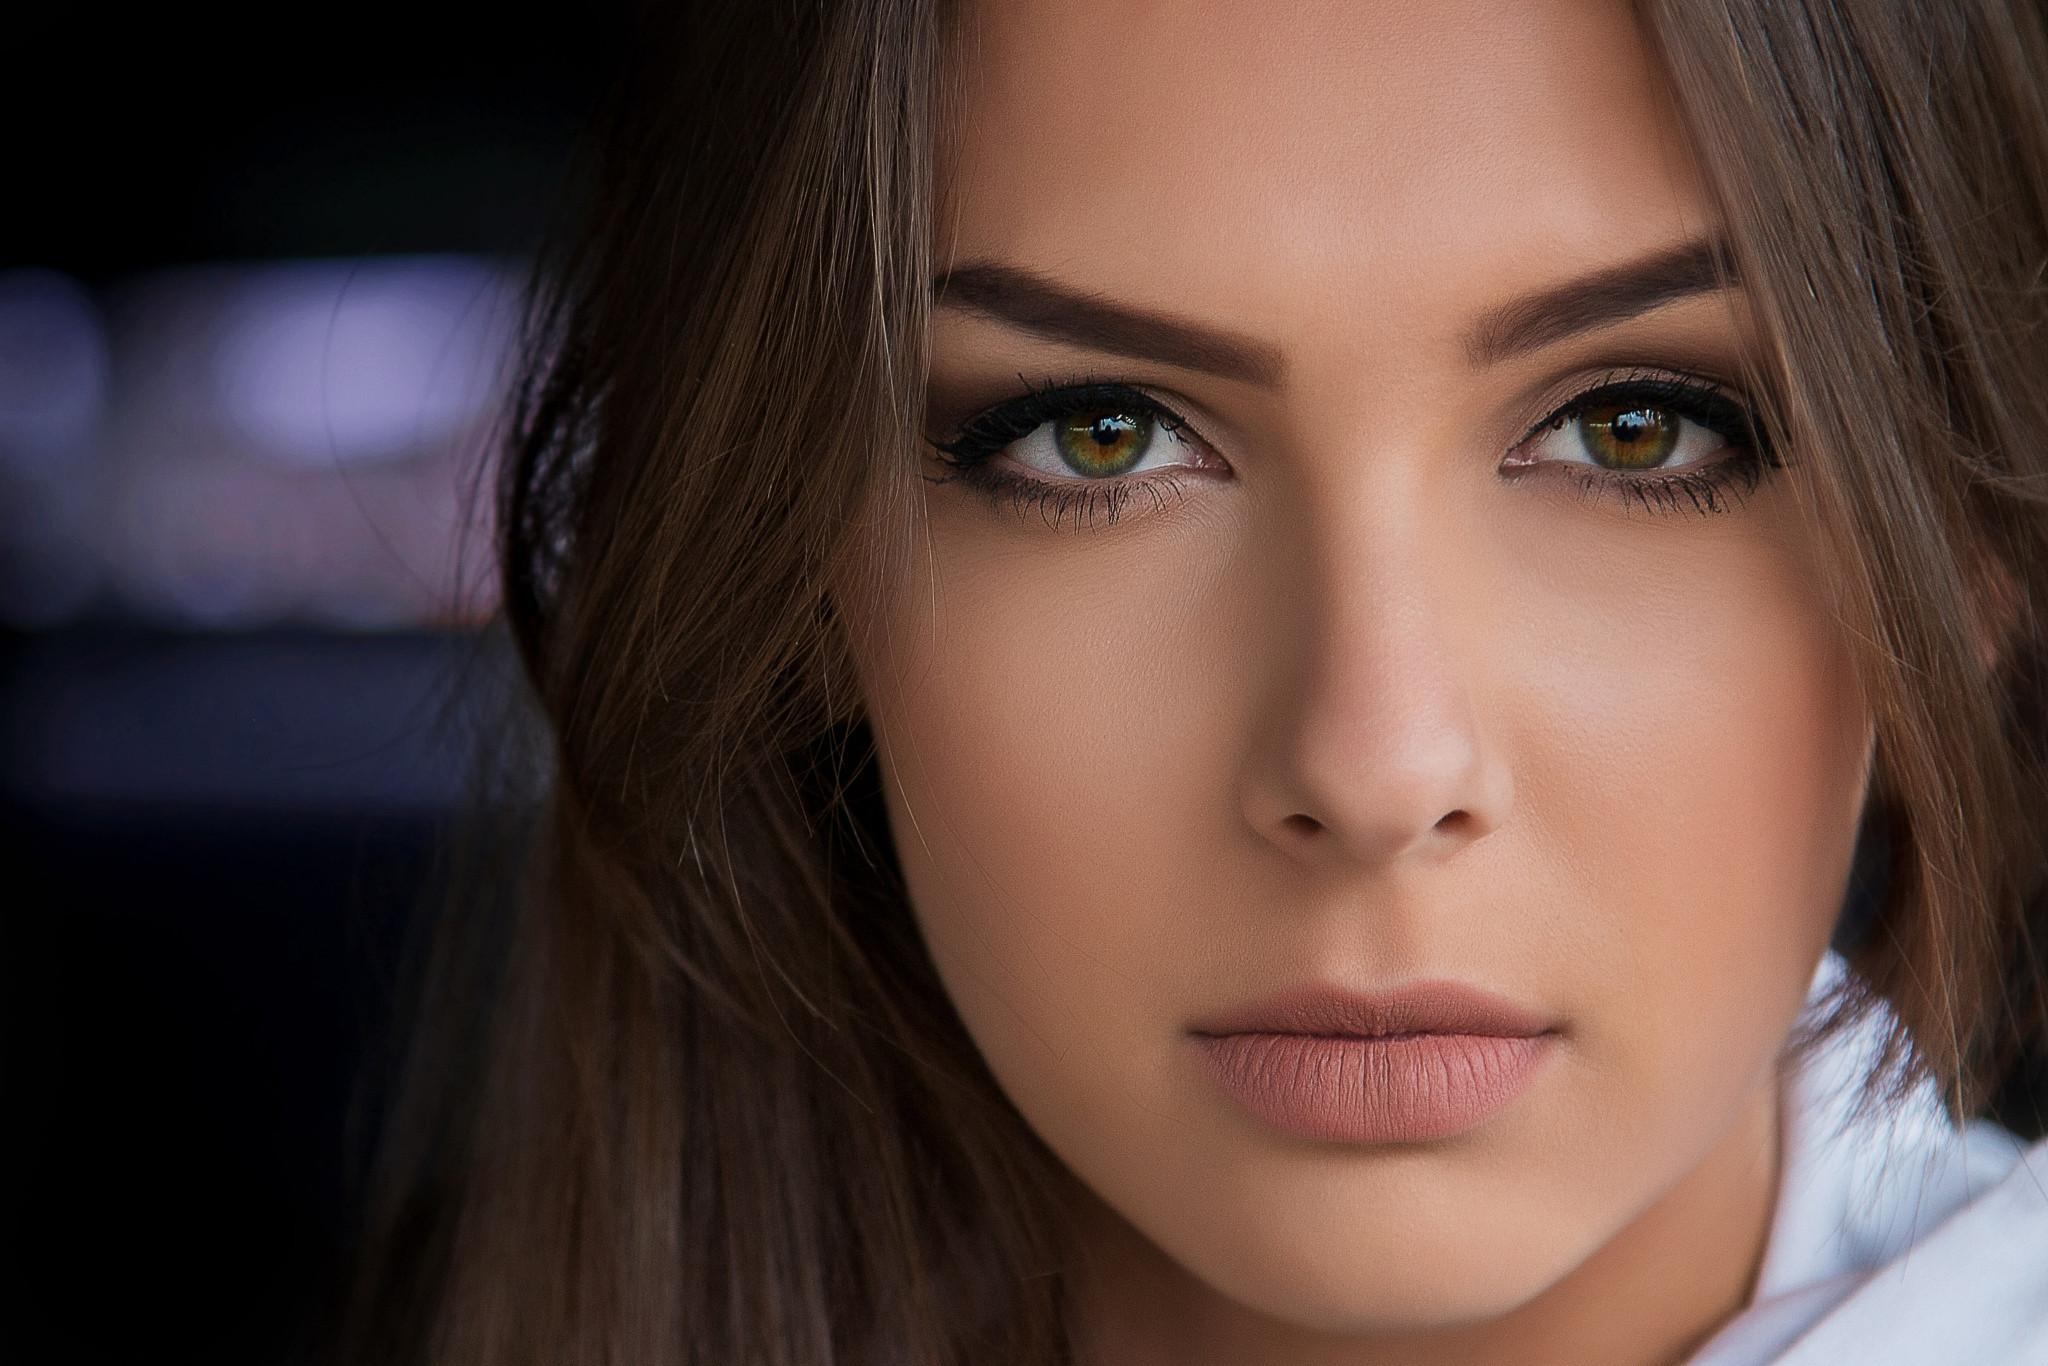 Face HD Wallpapers Backgrounds Wallpaper · Model FaceWoman FaceBeautiful …